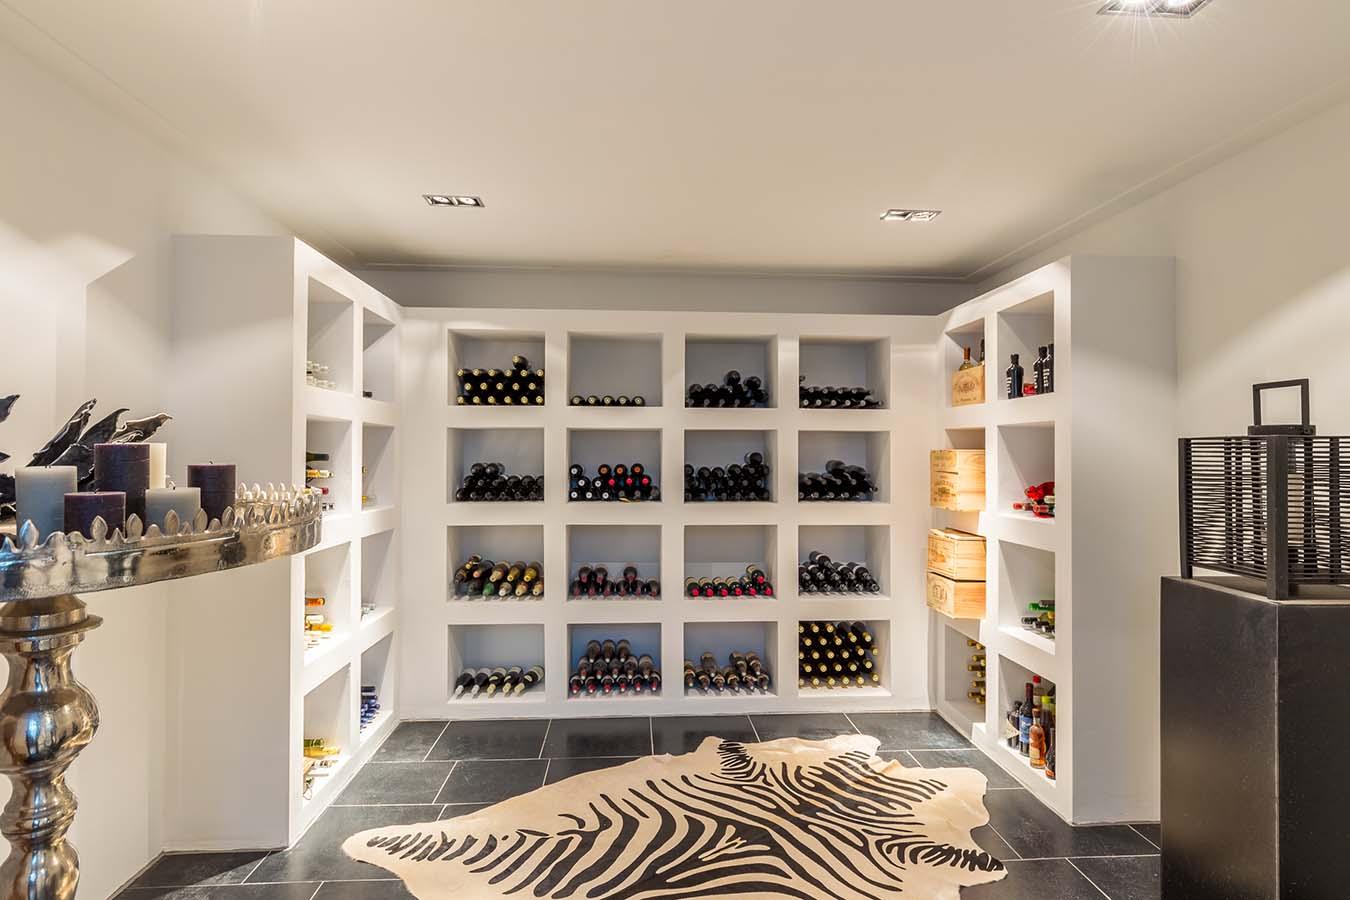 wijnkast in woning